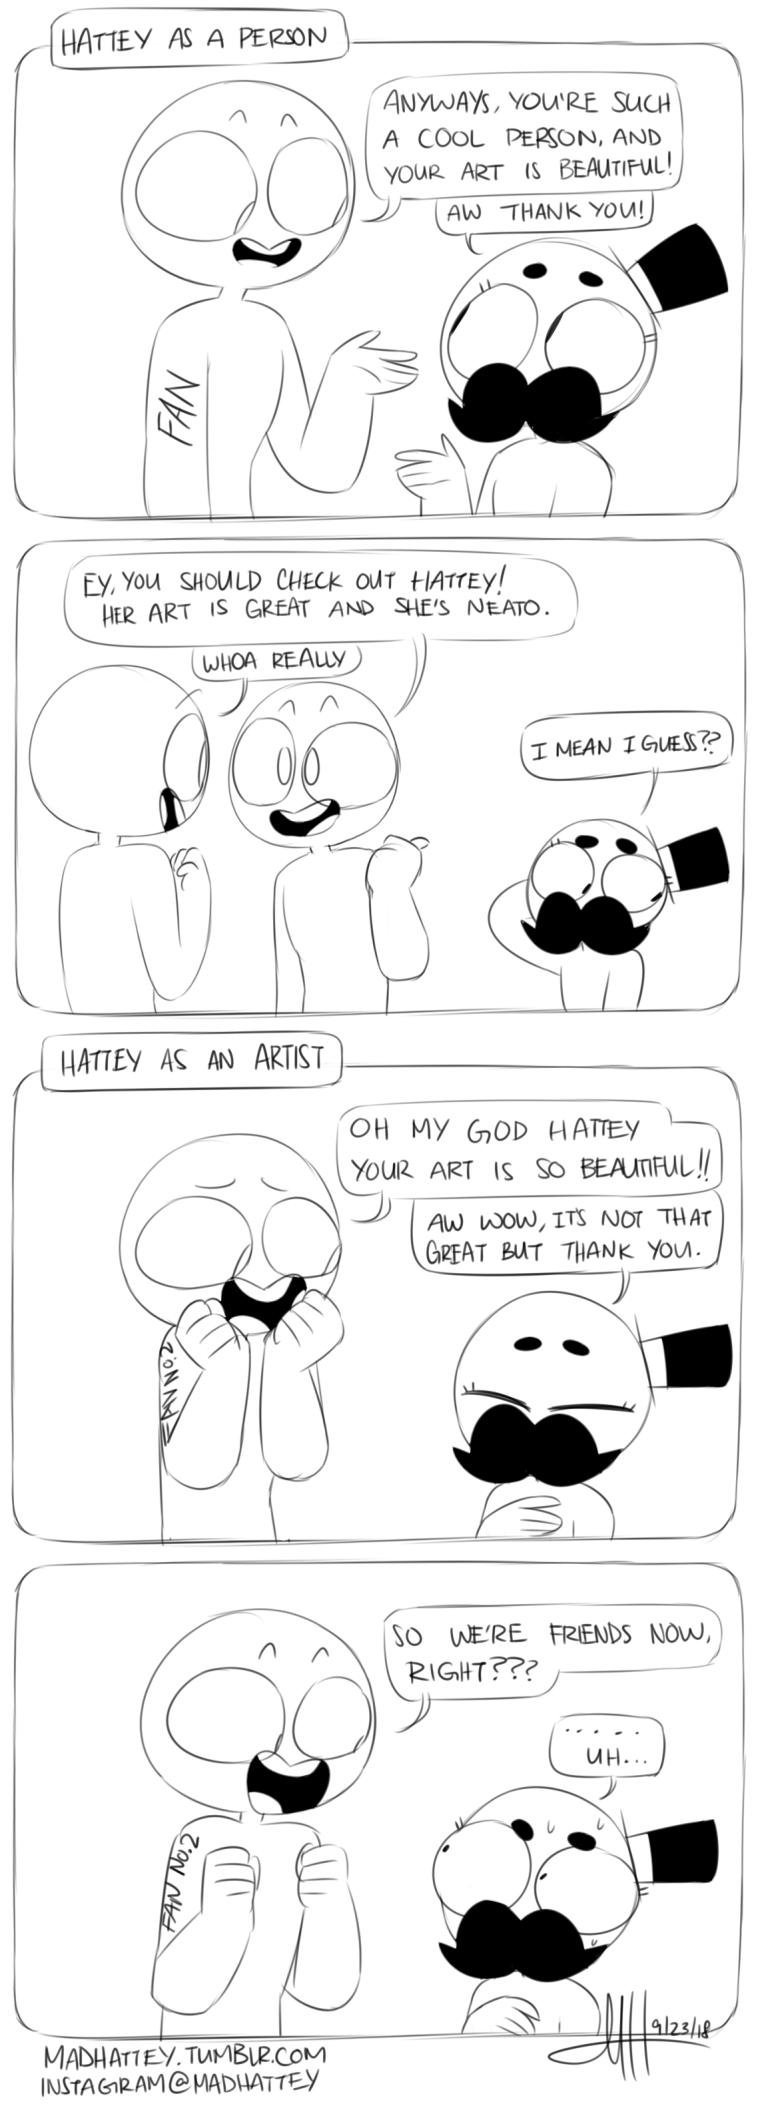 an artist or friend